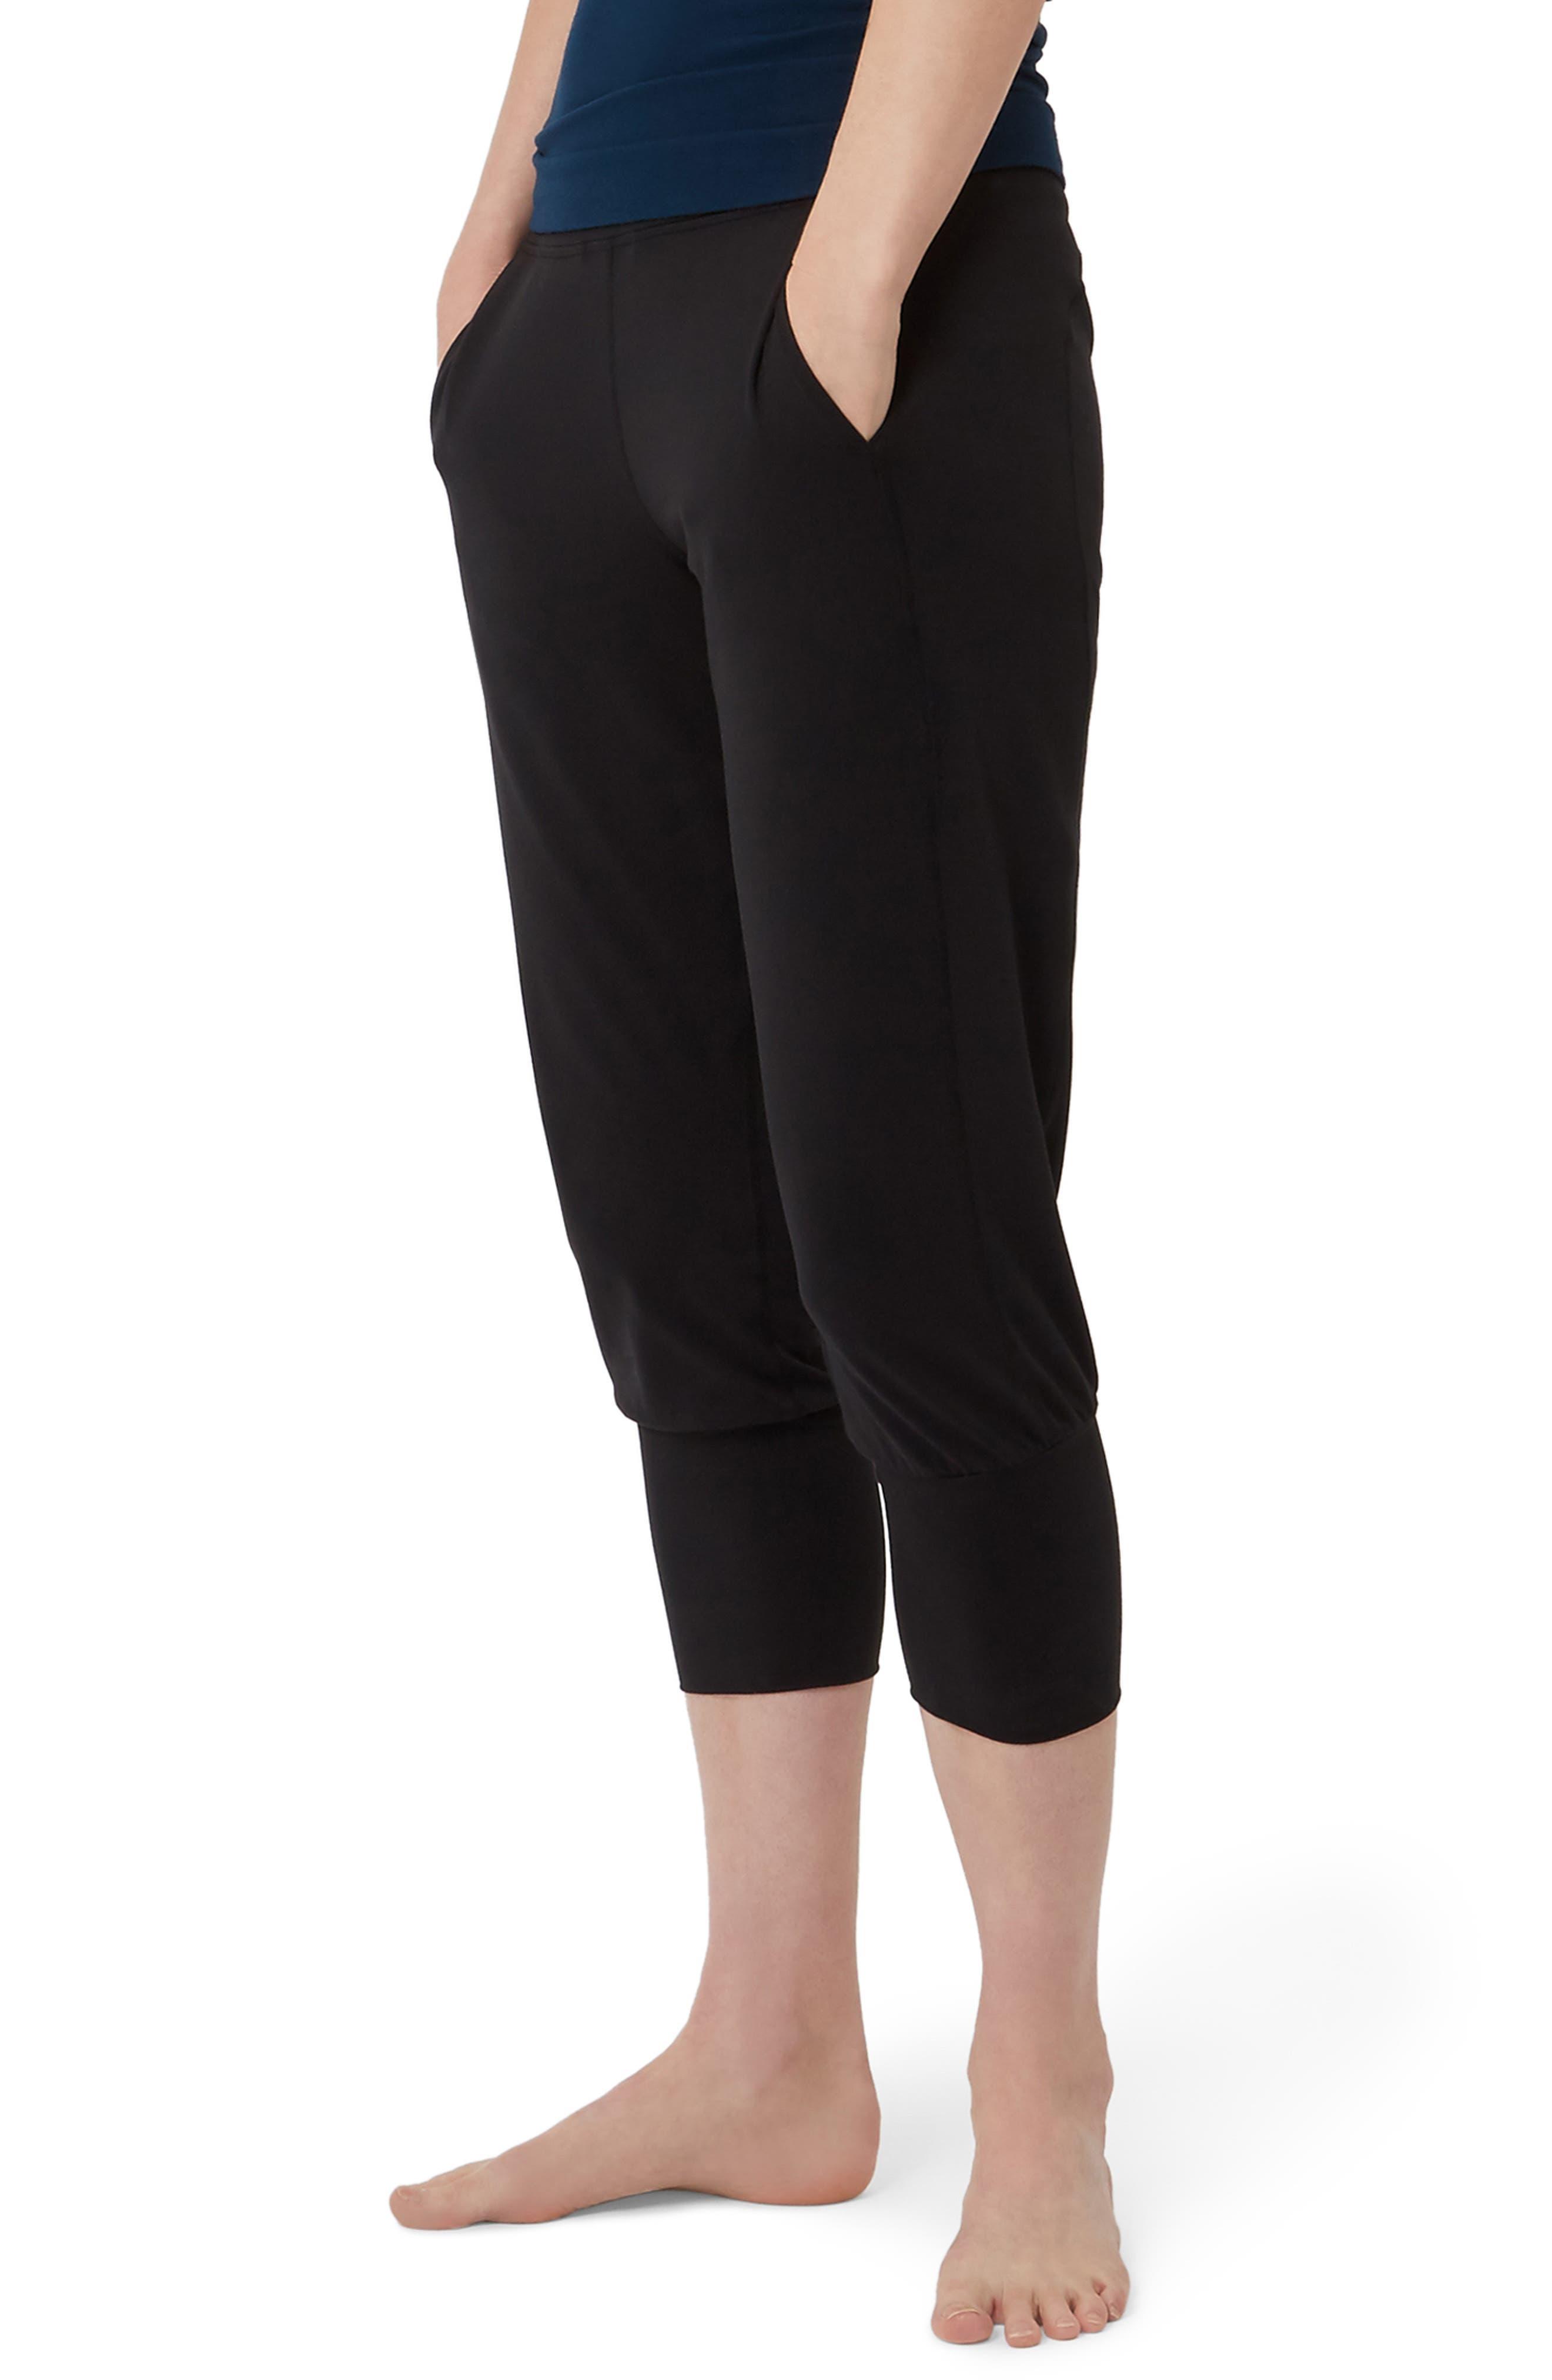 SWEATY BETTY, Garudasana Crop Yoga Trousers, Alternate thumbnail 4, color, BLACK